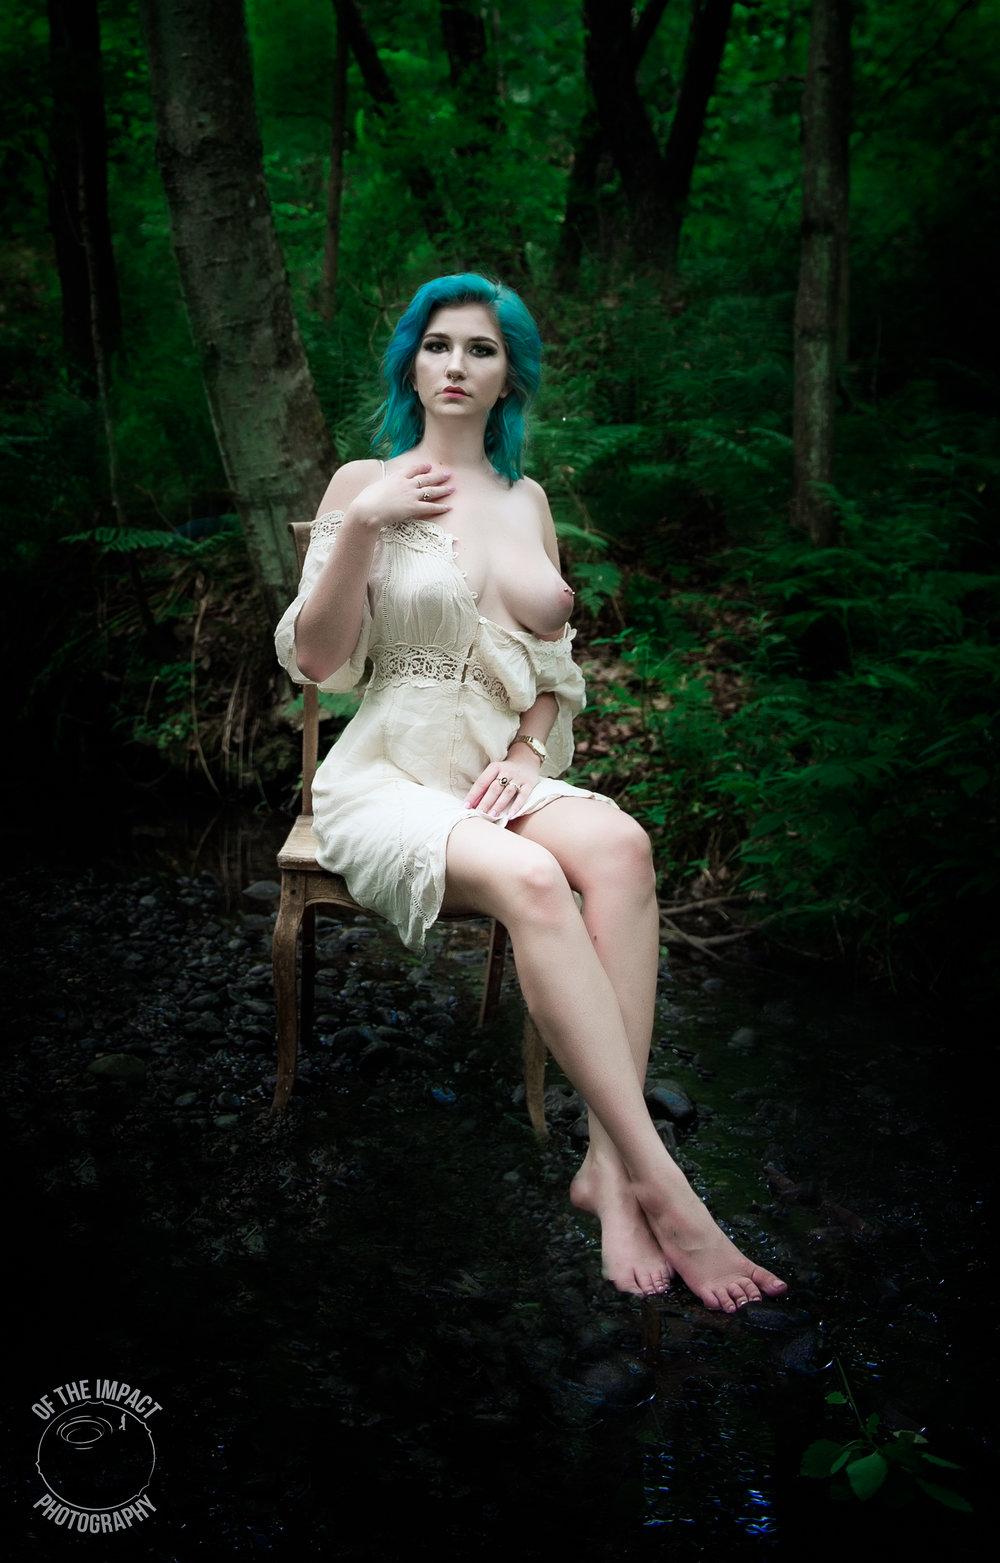 casey woods (1 of 1).jpg